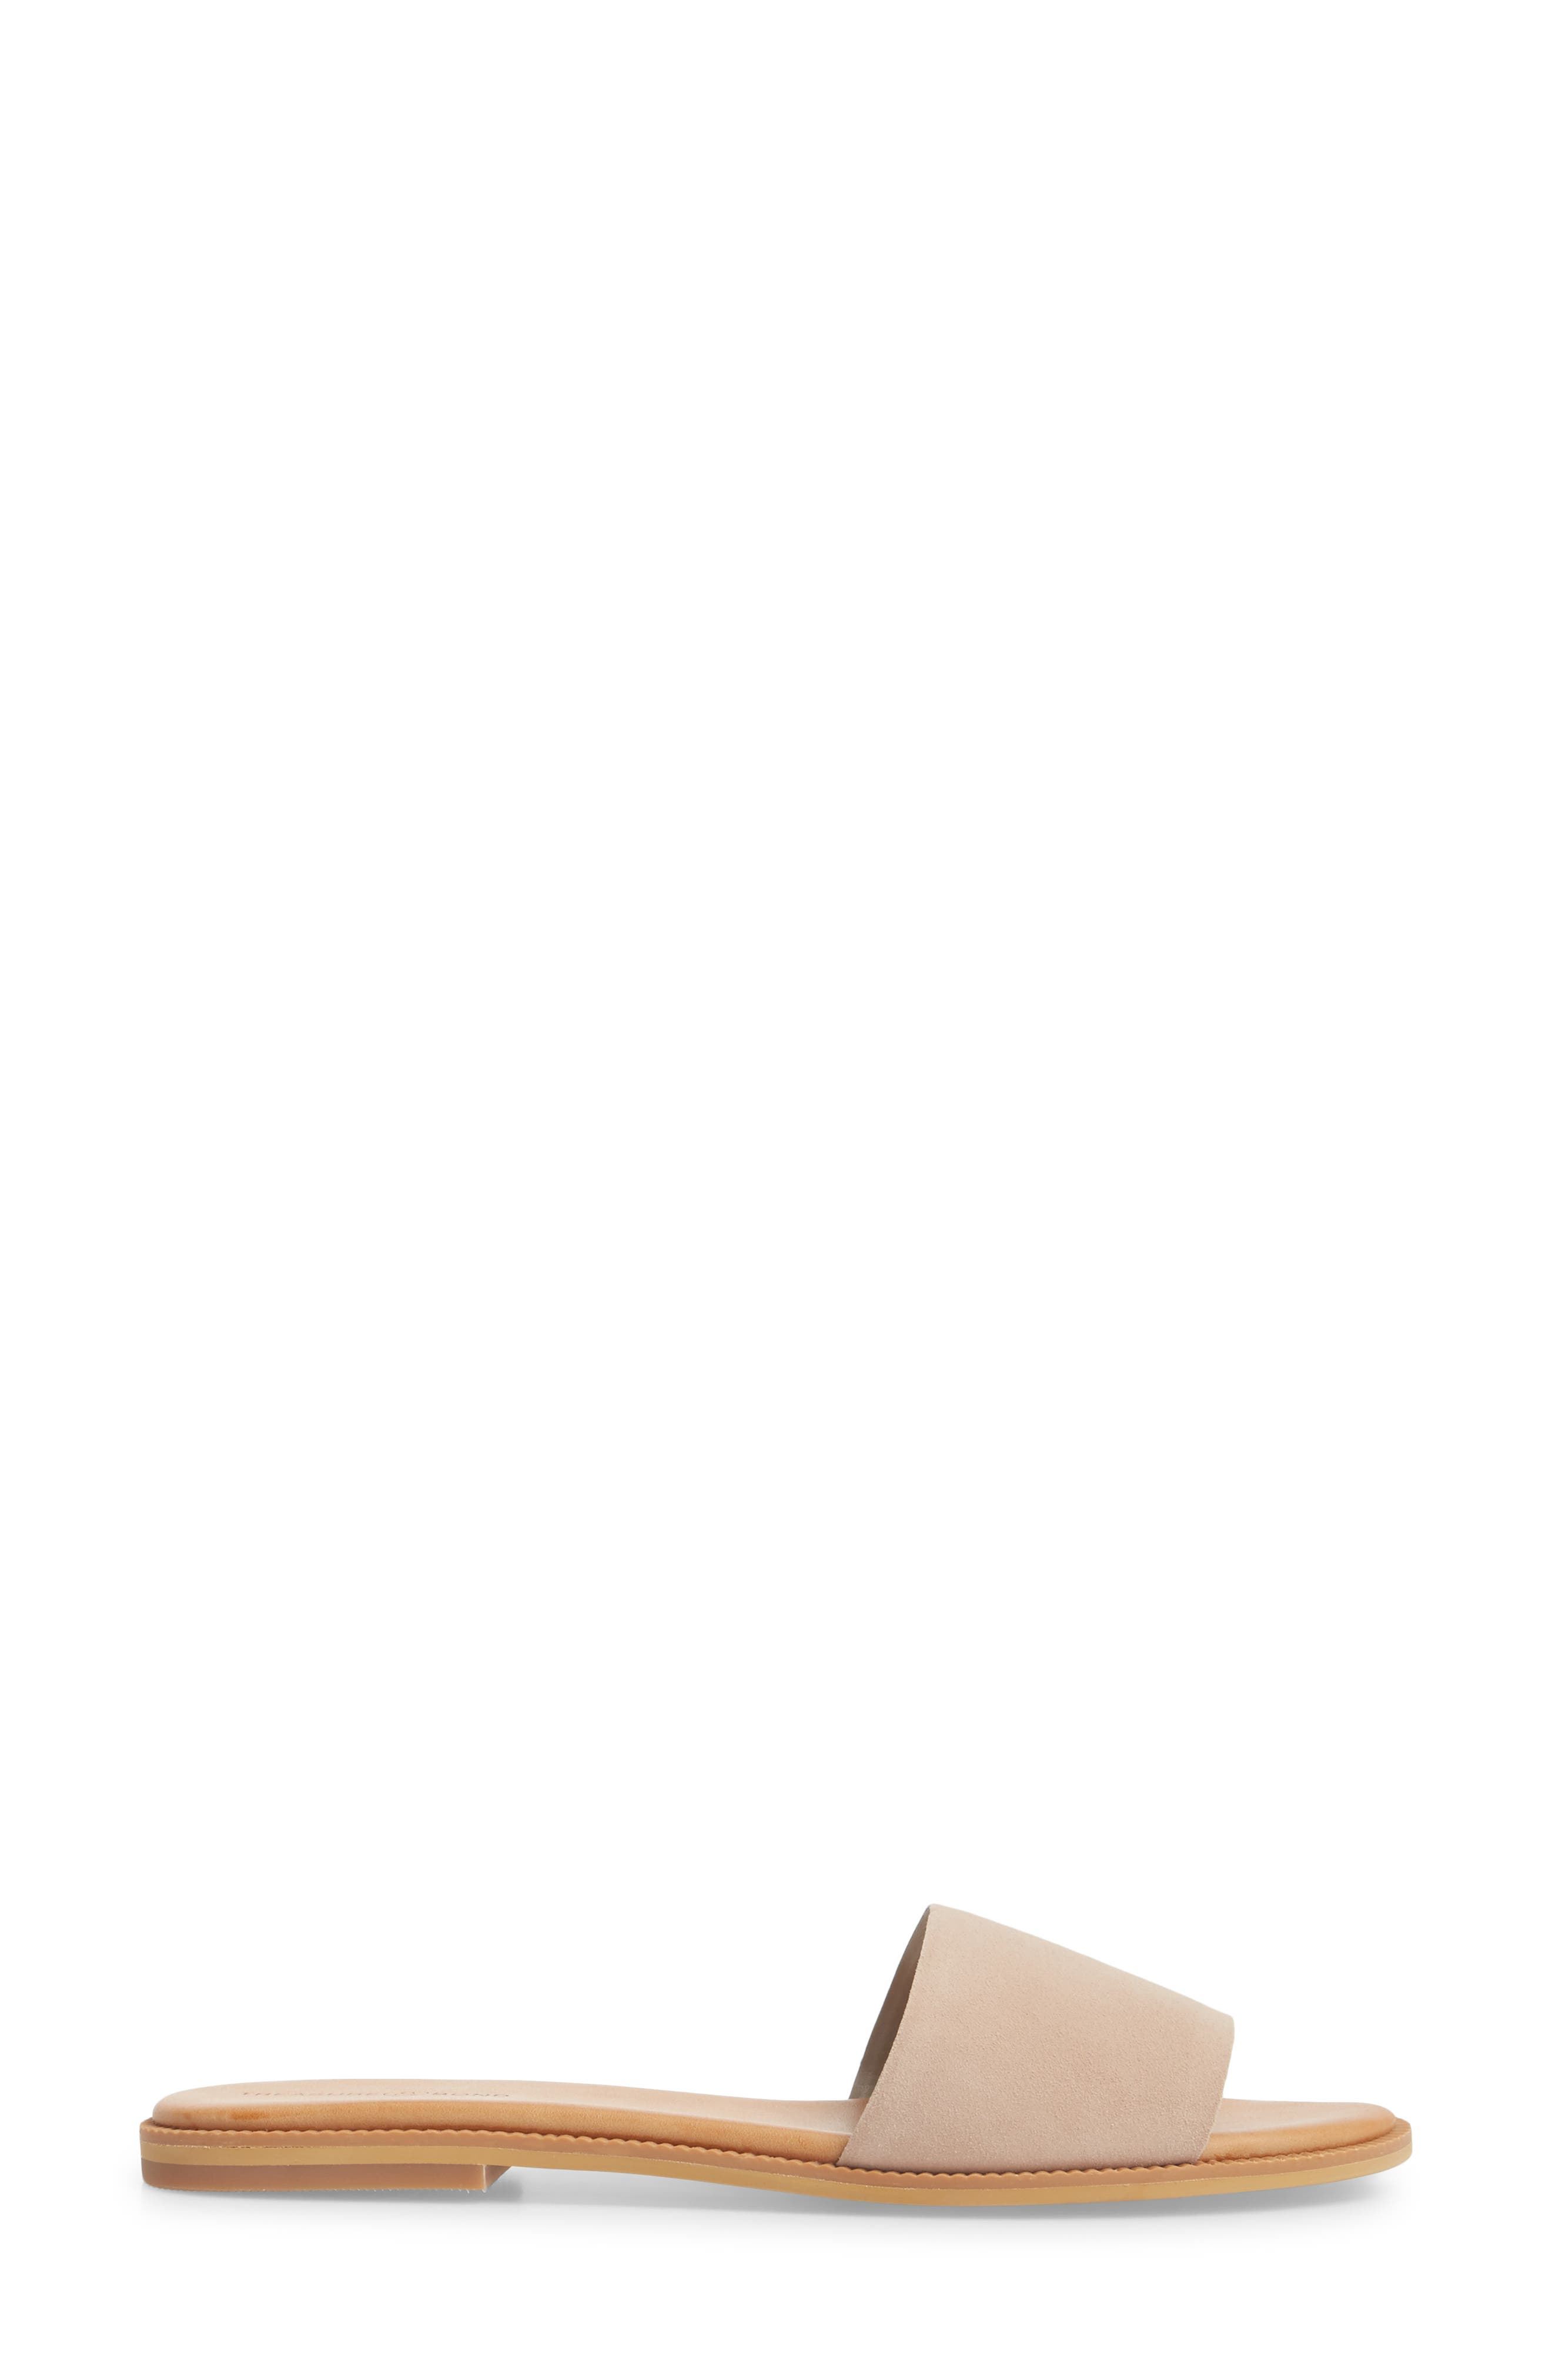 TREASURE & BOND, Mere Flat Slide Sandal, Alternate thumbnail 3, color, NEW BLUSH SUEDE